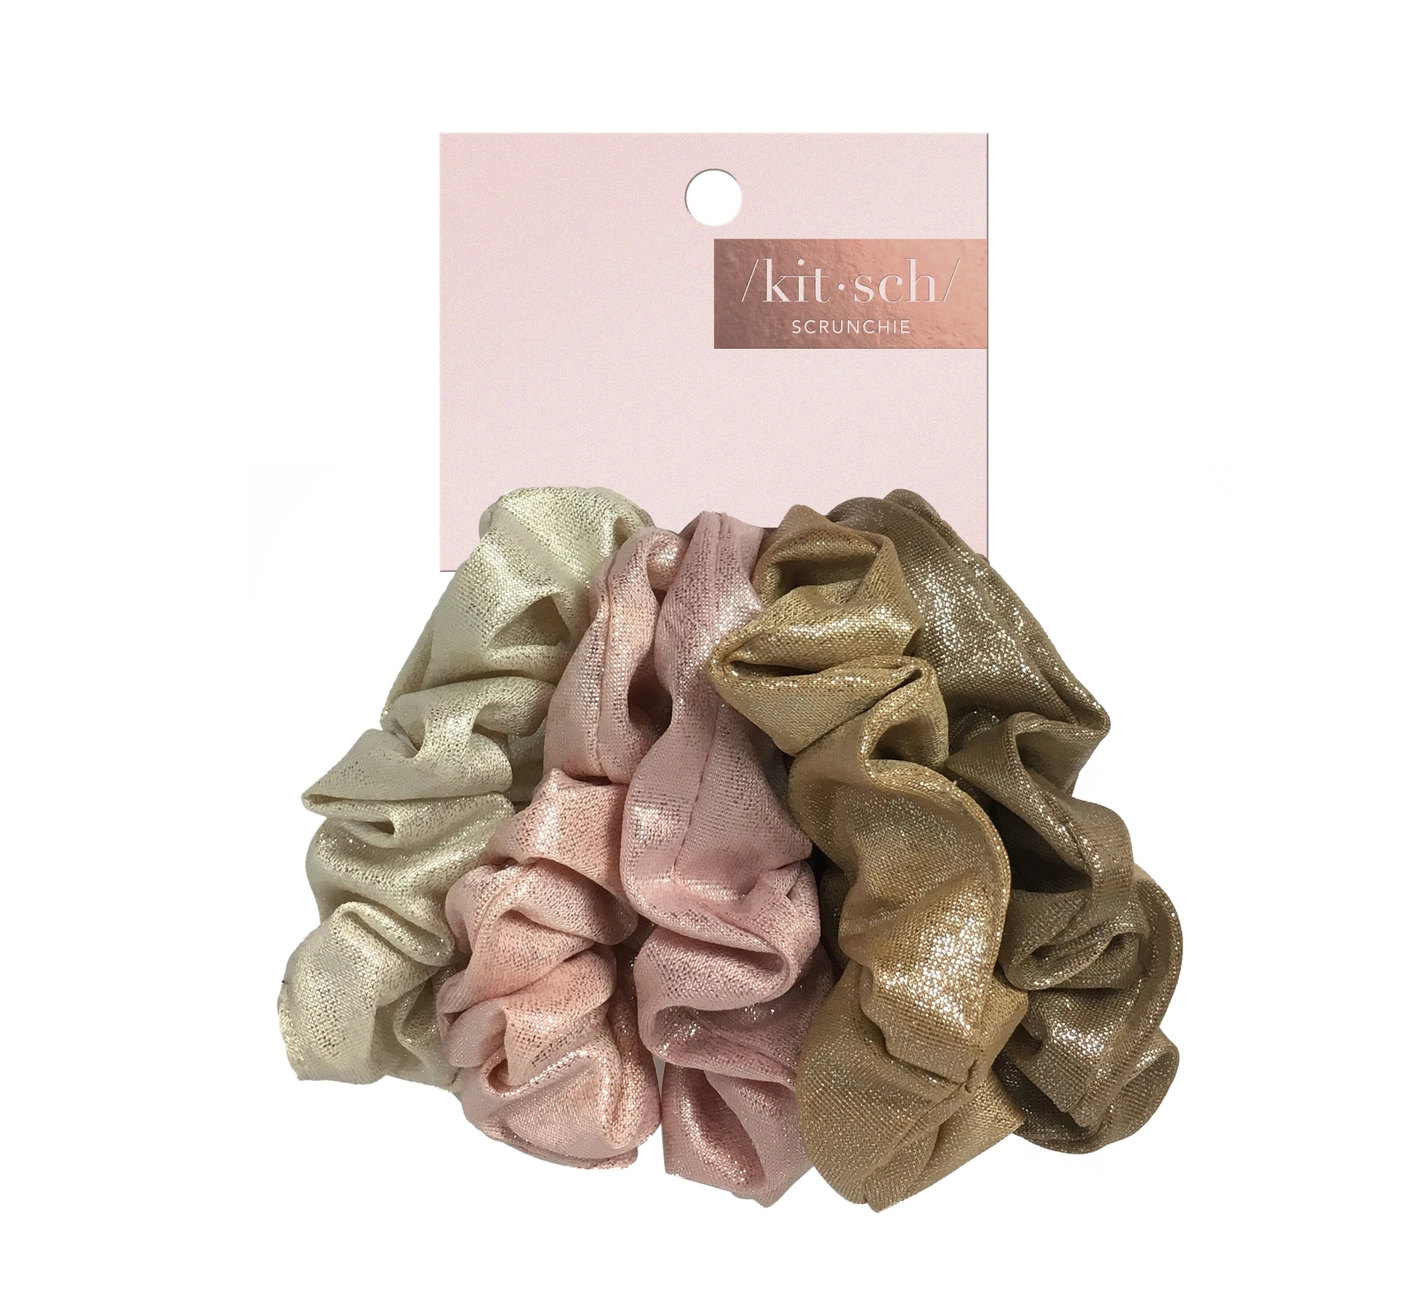 Kitsch Metallic Scrunchies - Blush and Mauve